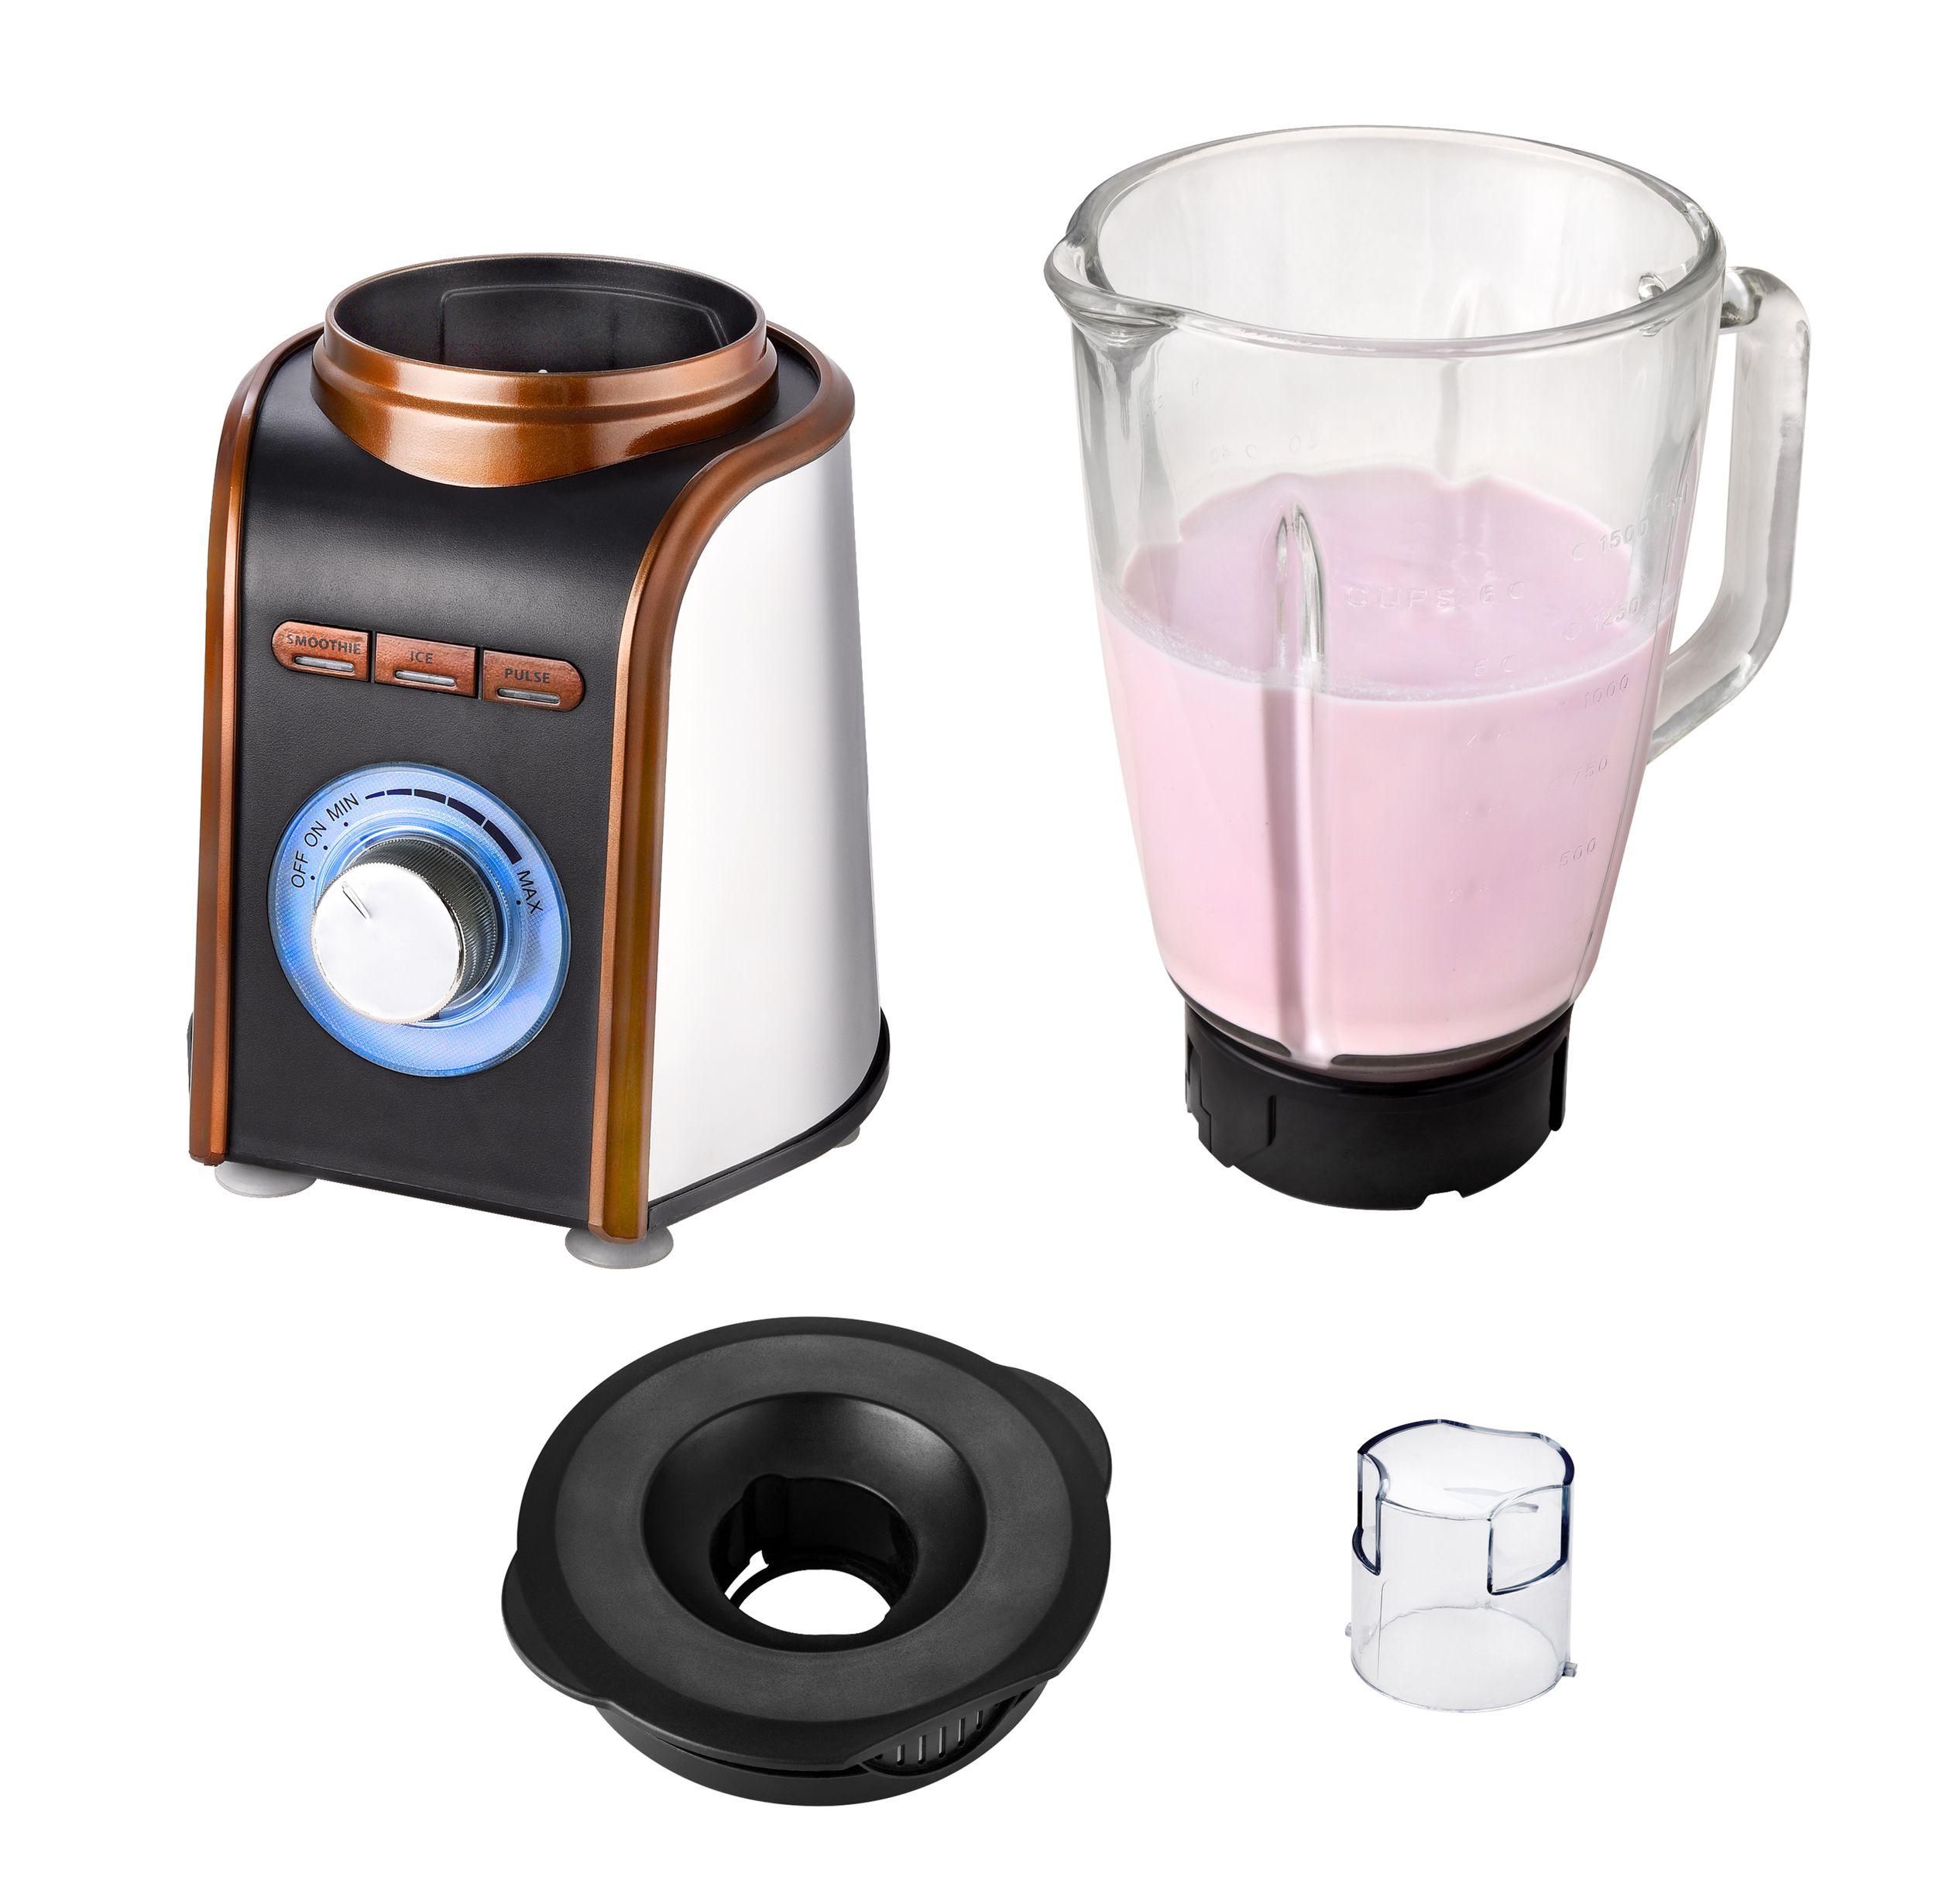 Standmixer Blender Smoothiemaker Cocktailmixer Glaskrug Eis Crusher 1,5 Liter 700 W NEU*94227 Bild 3